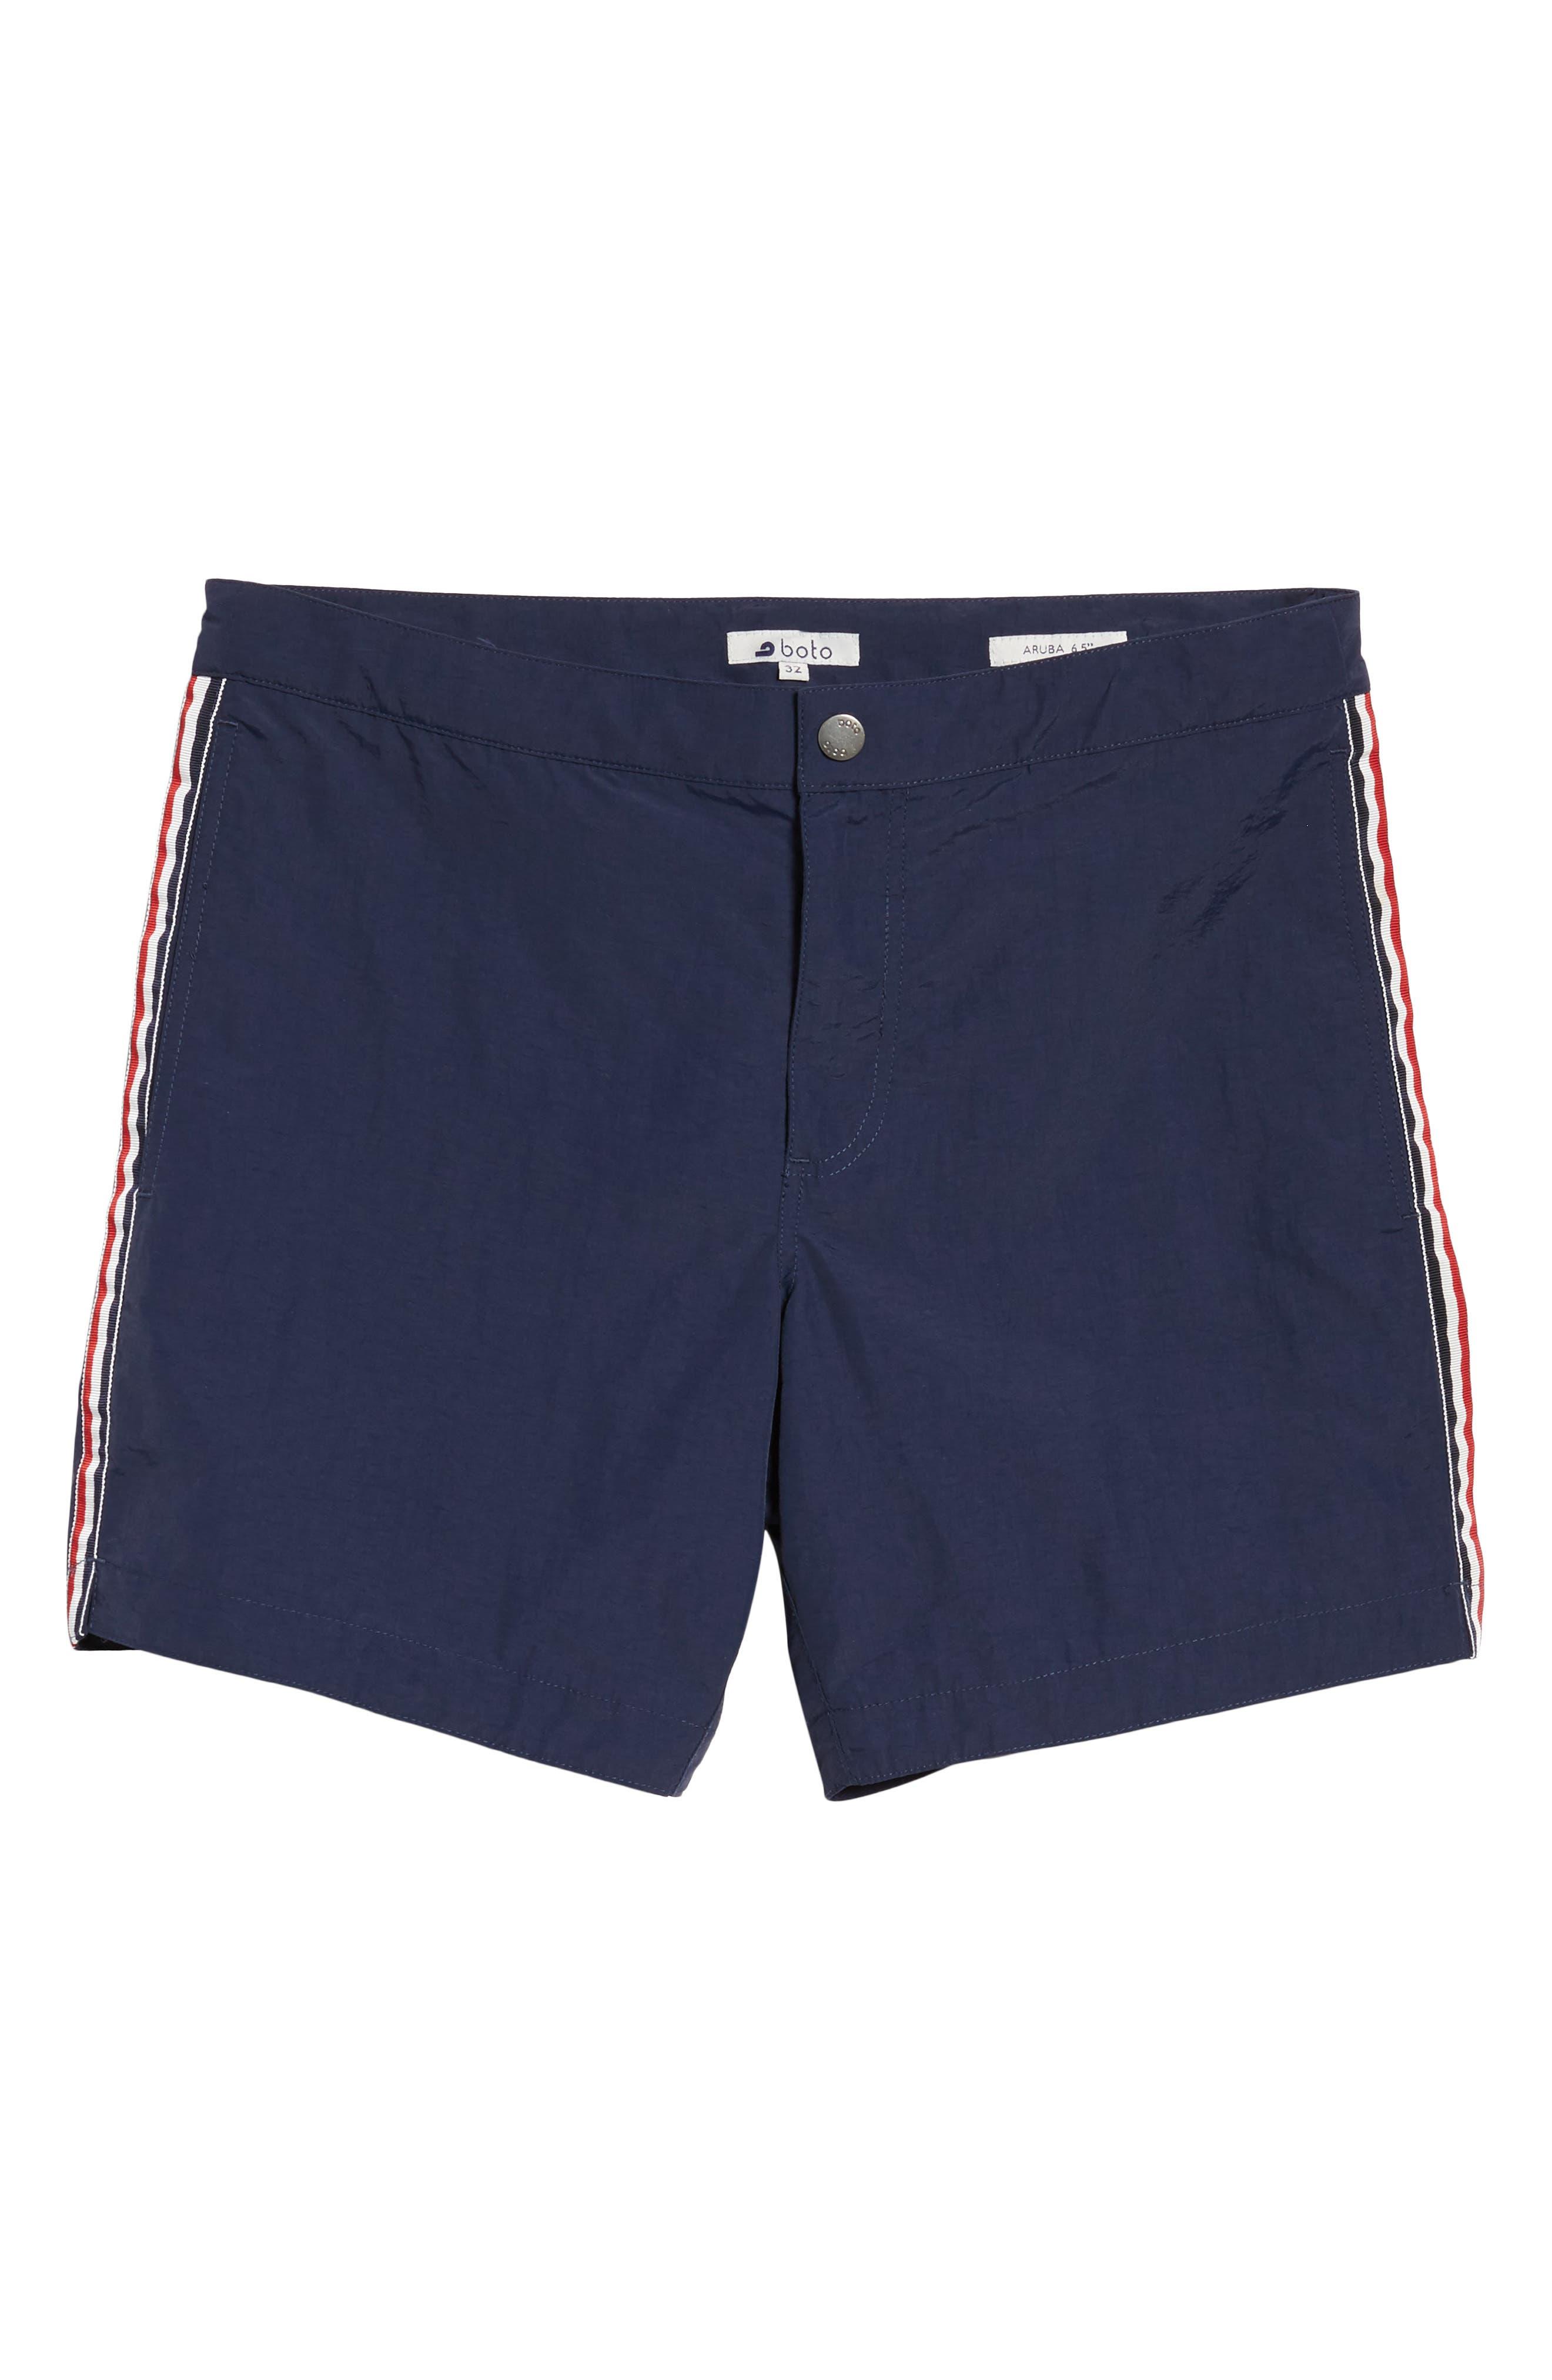 Aruba Tailored Fit French Stripe Swim Trunks,                             Alternate thumbnail 6, color,                             Navy French Stripes